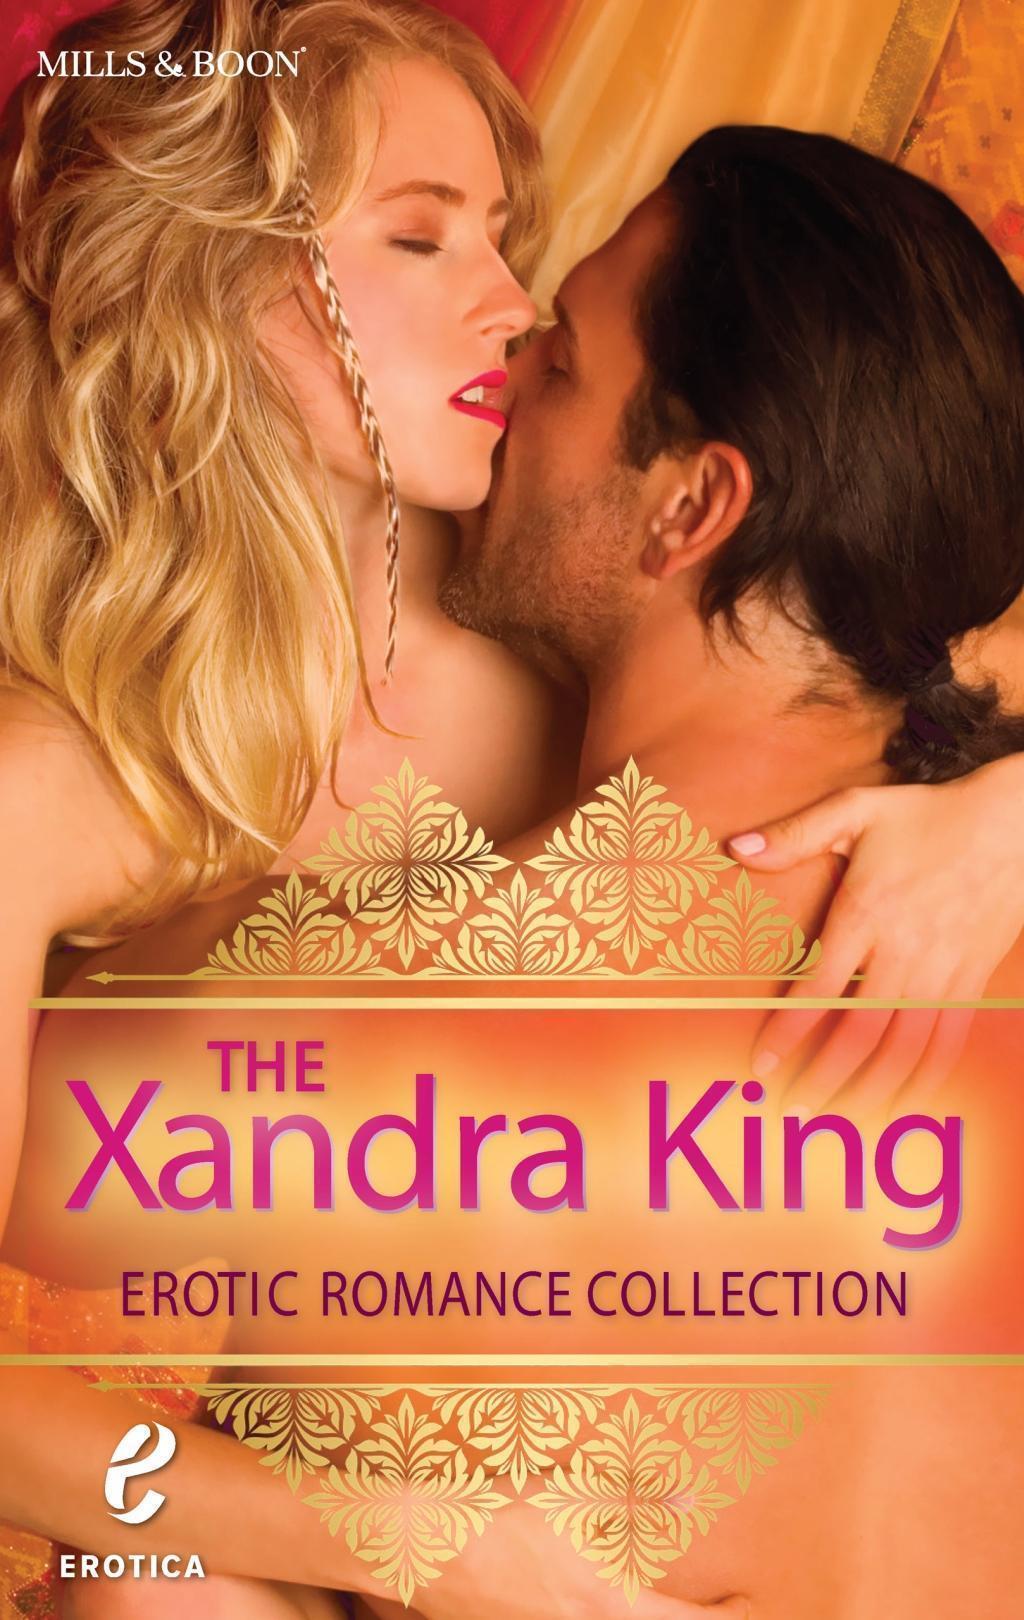 The Xandra King Erotic Romance Collection: Celestina and the Sultan / Celestina, Warrior Queen (Erotic Romance, Book 1)